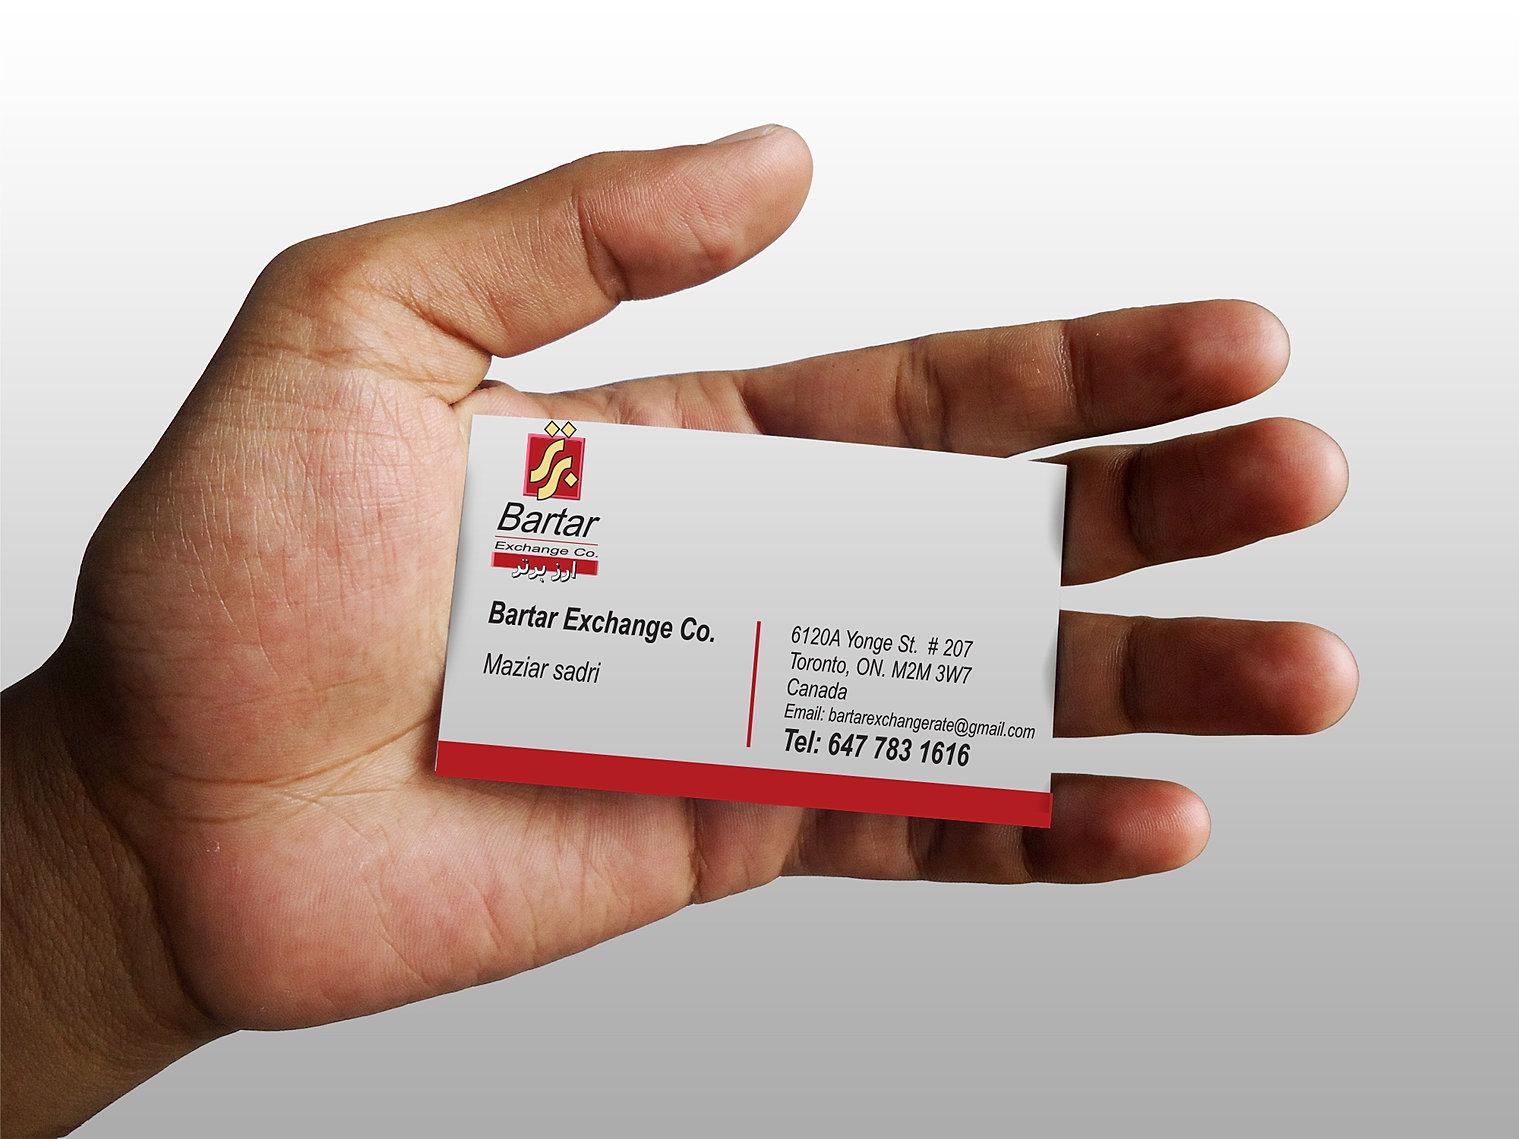 13pt Linen Business Card Print  North York   Toronto   SIGNVALUE